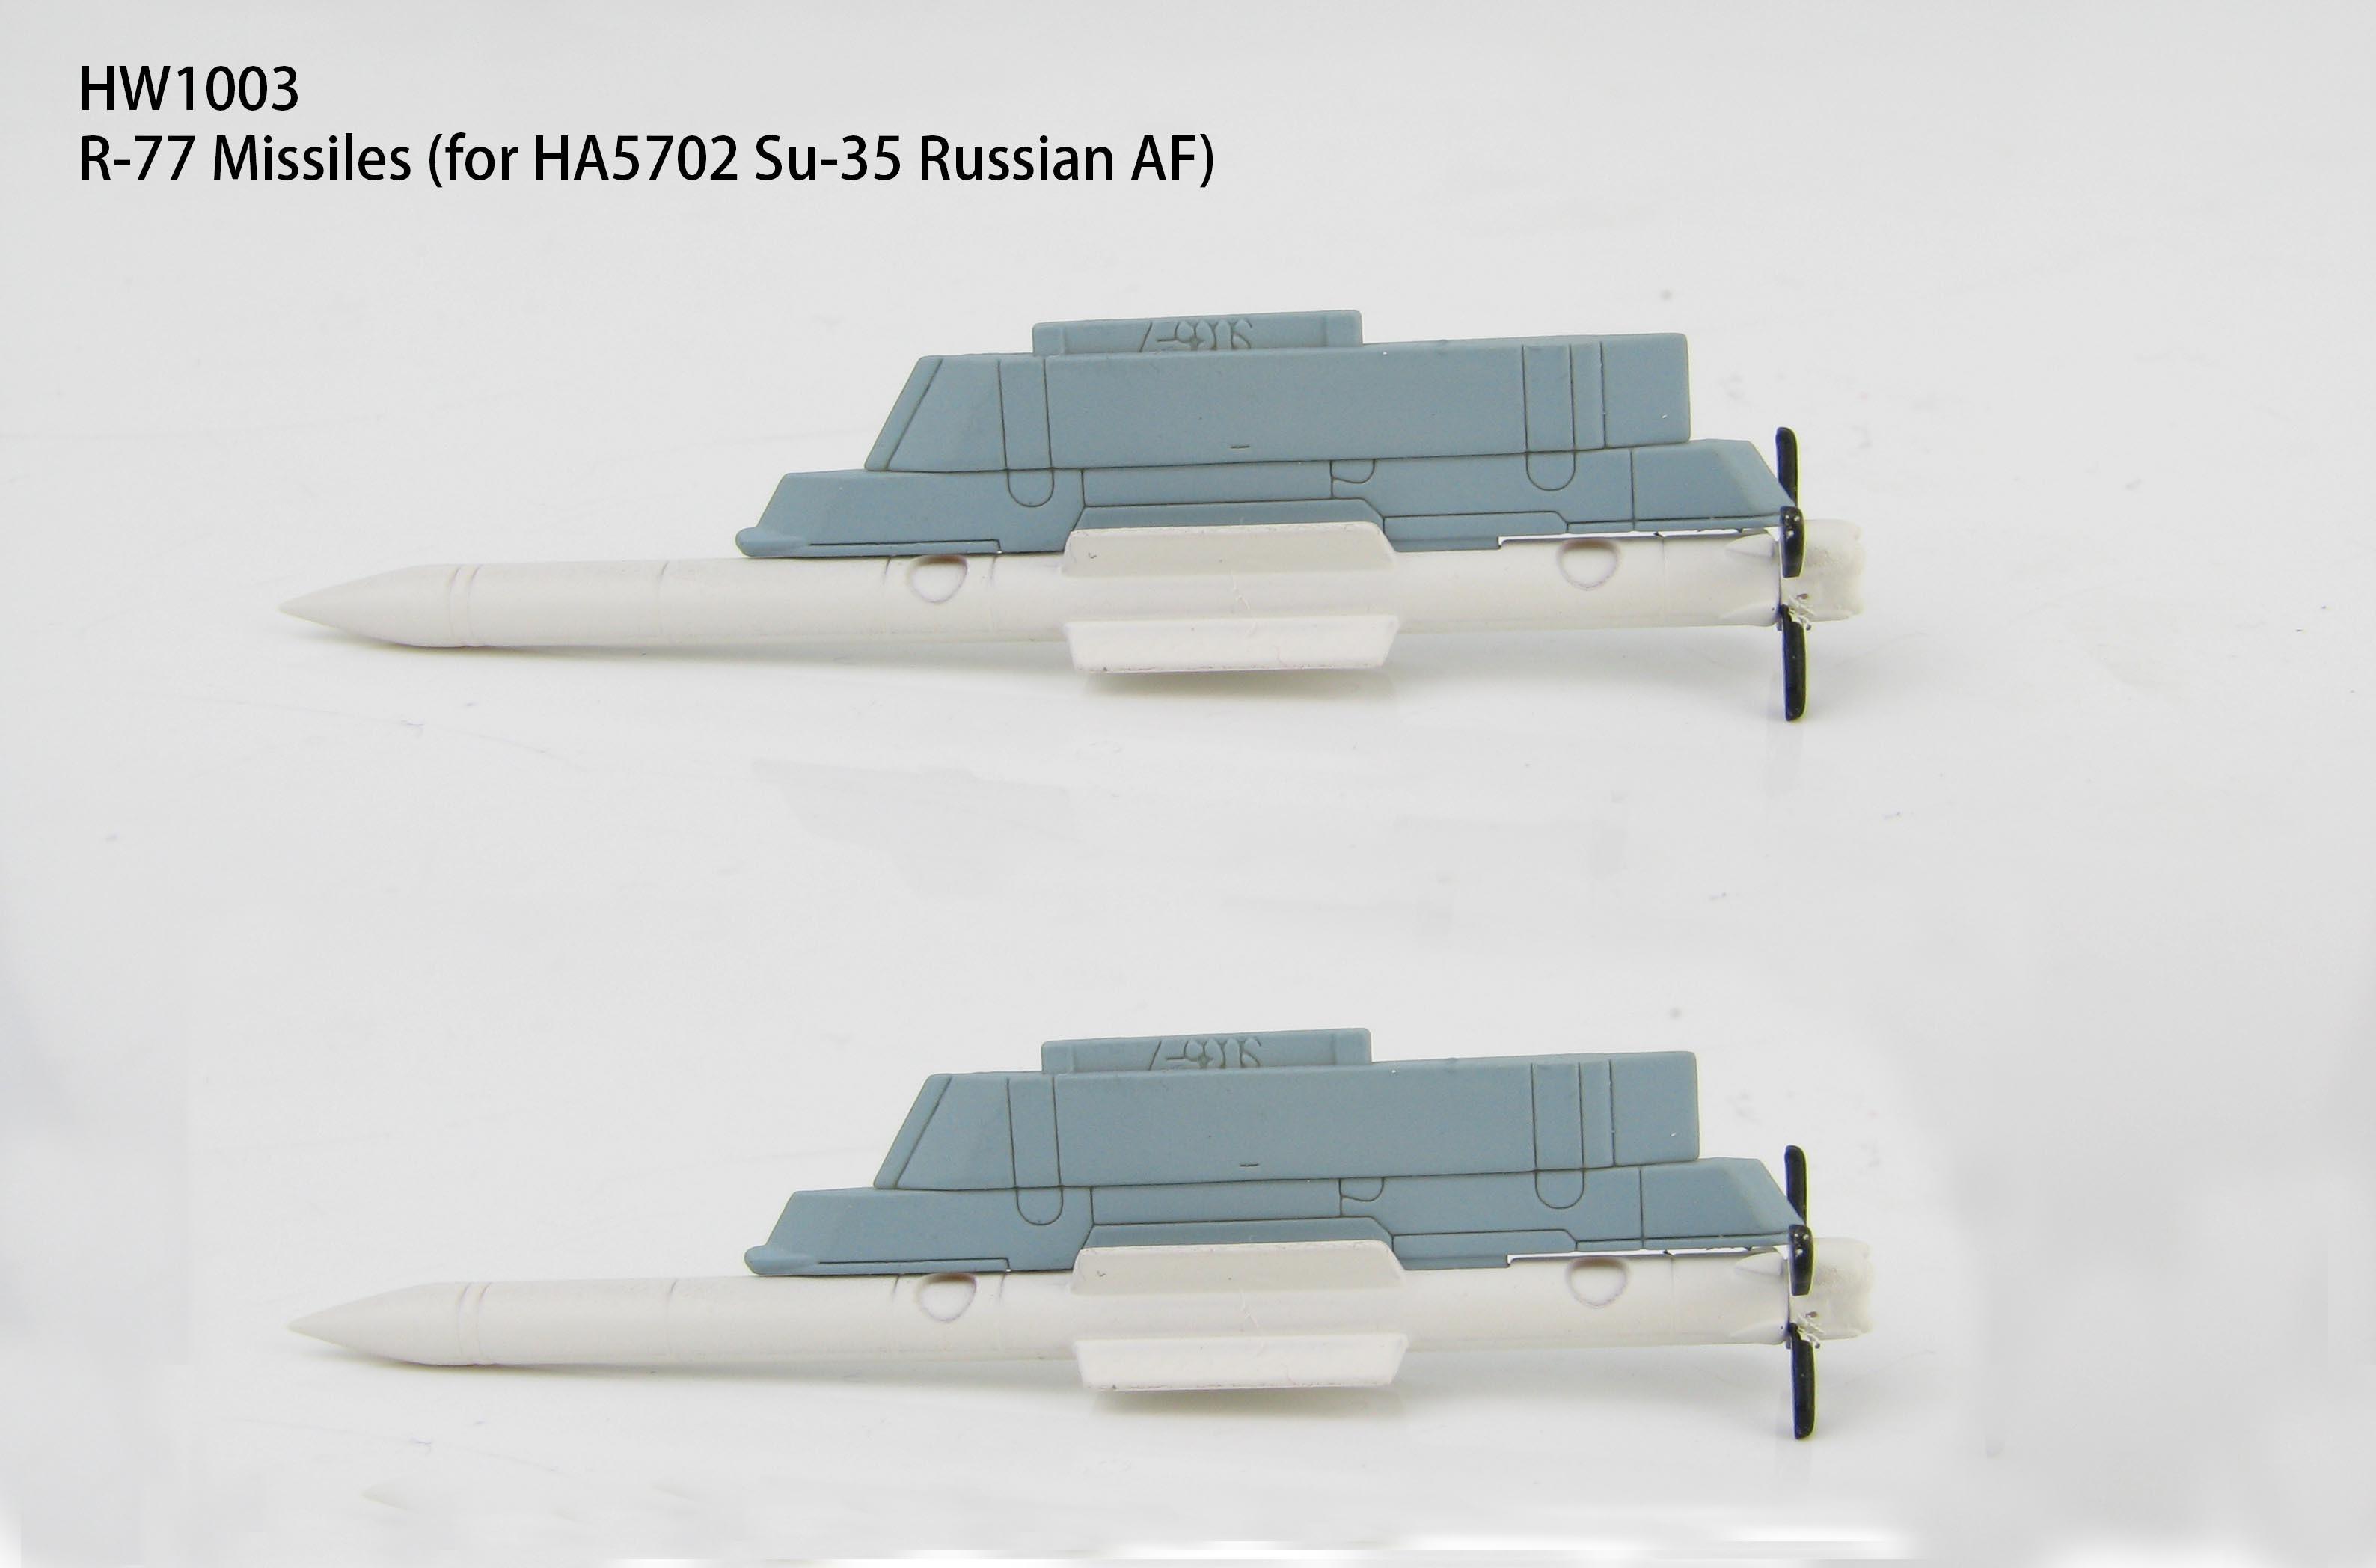 NEU in OVP 179 x 154 x 17,5 mm Faller 120275 Segment-Drehscheibe mit Servo